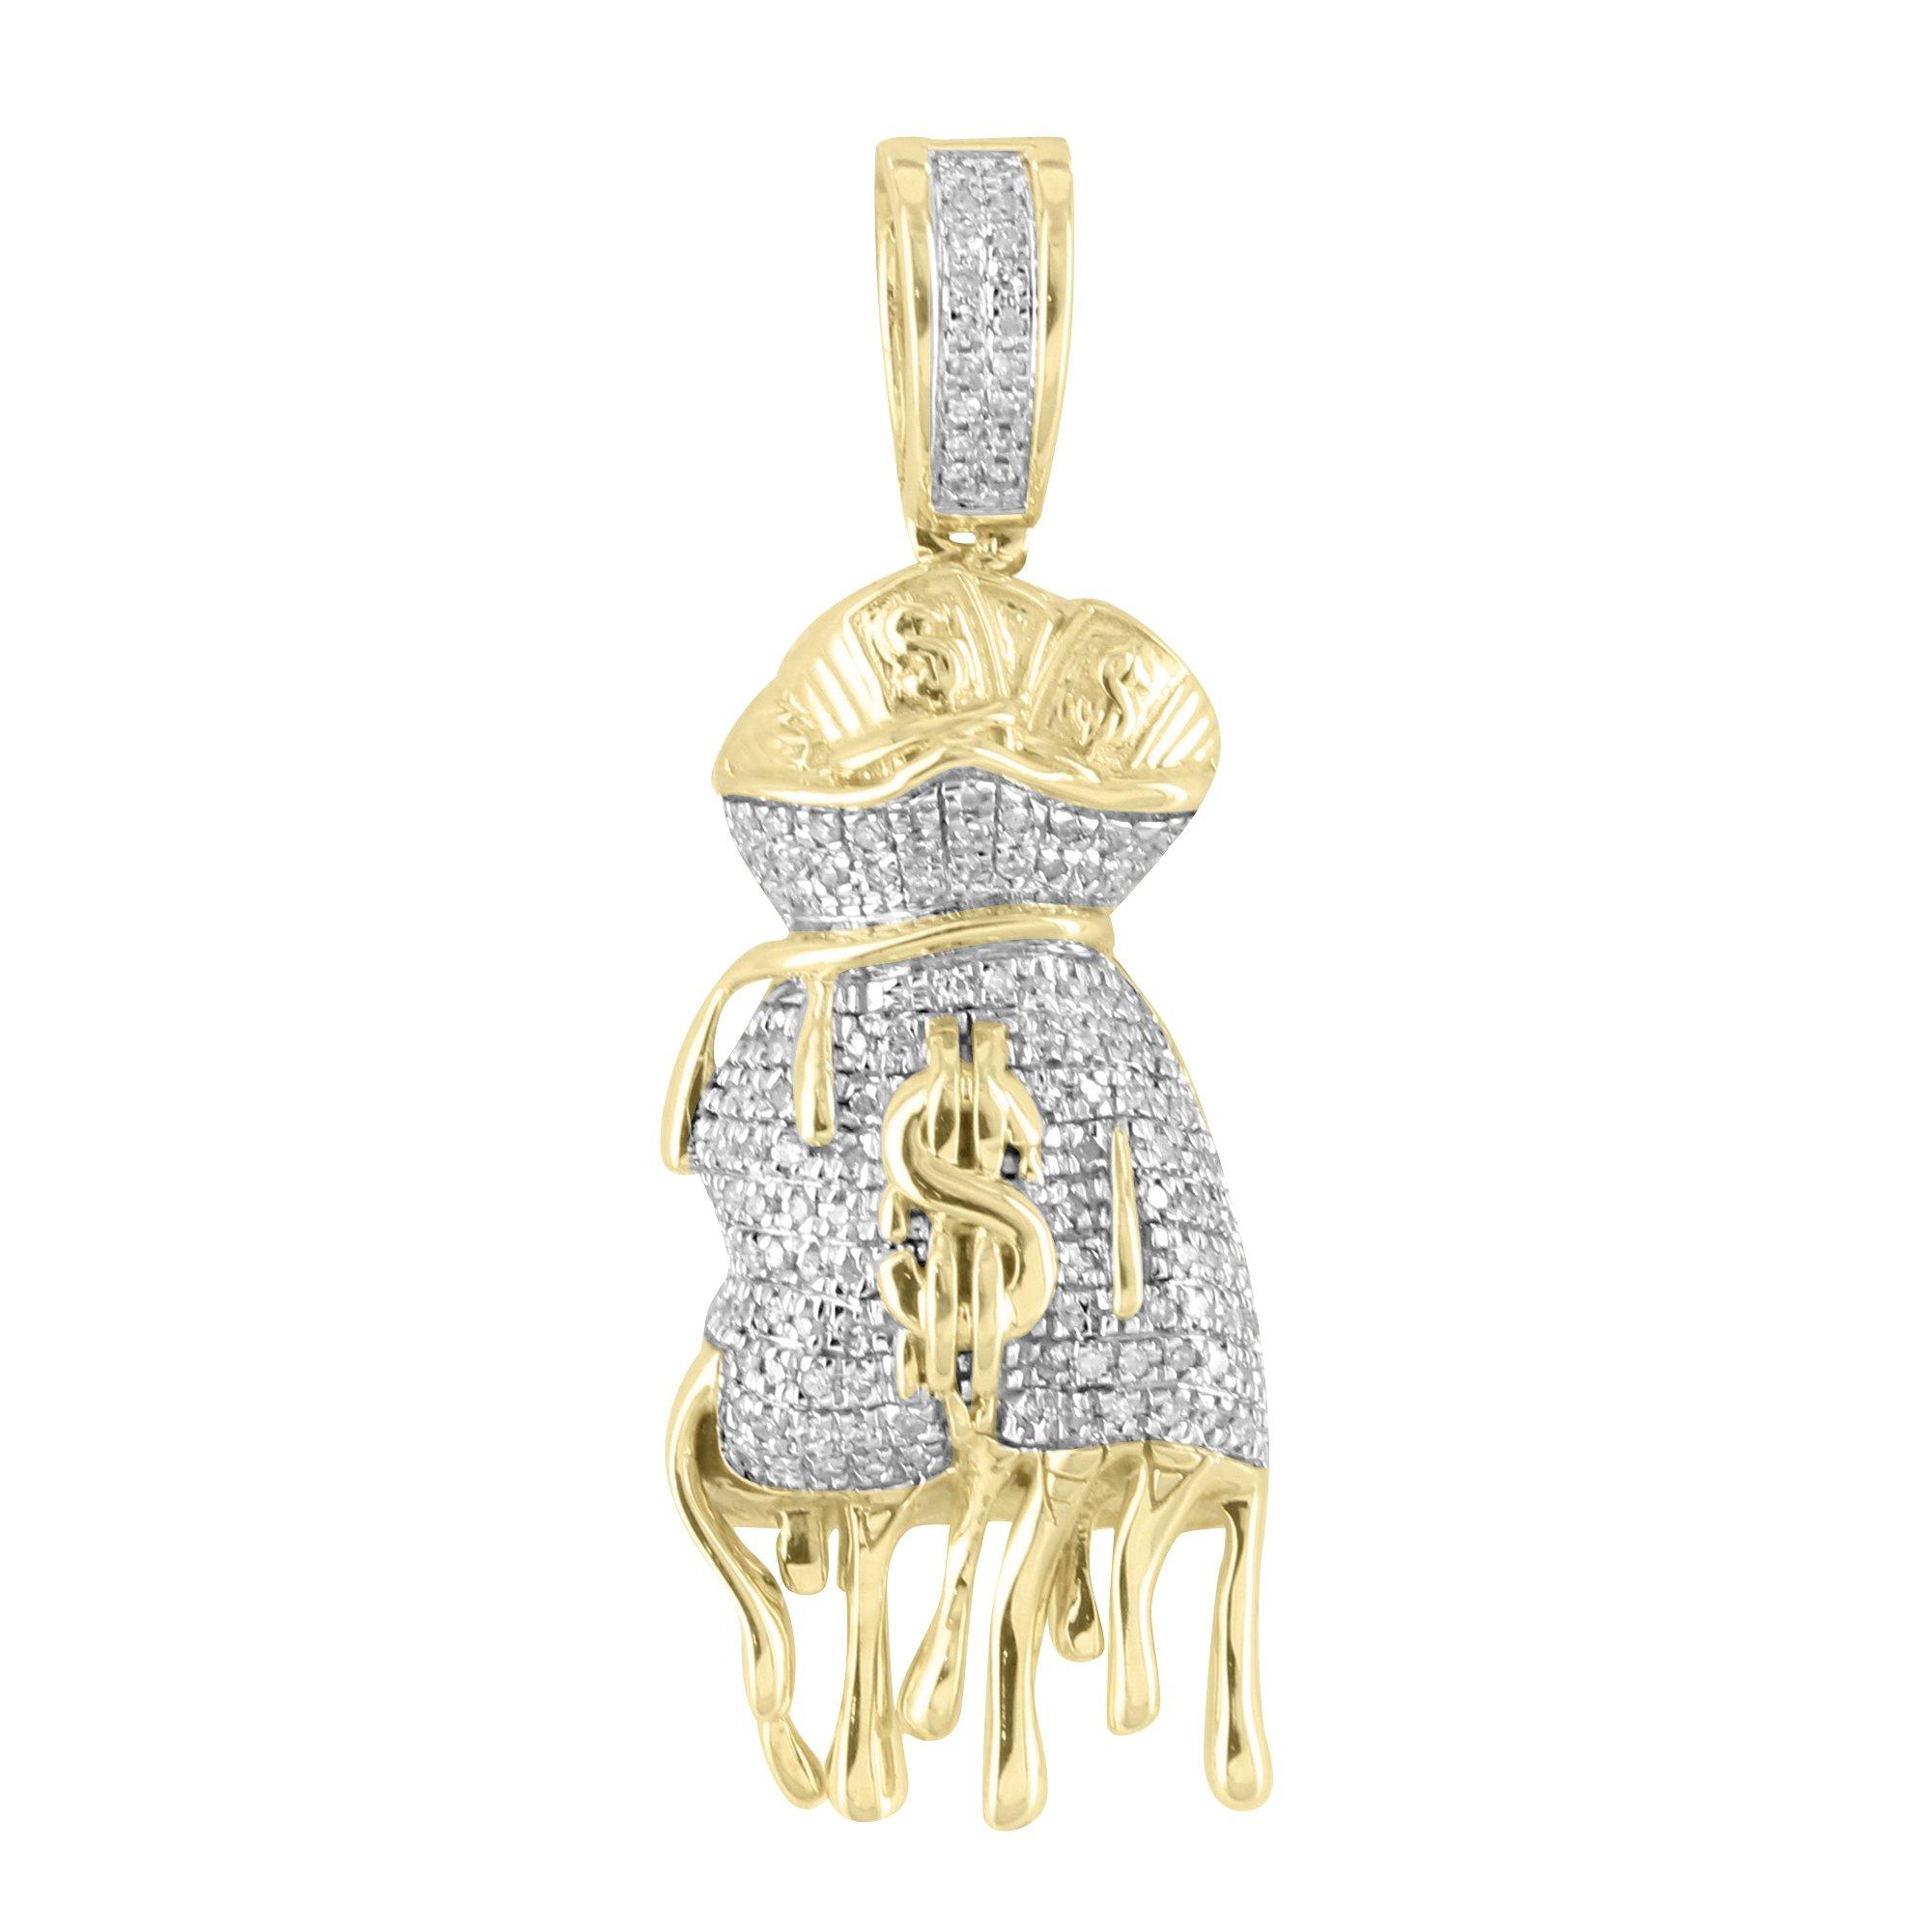 Dripping Money Bag Pendant 10k Yellow Gold Genuine Diamonds 1.6 Inch Charm New